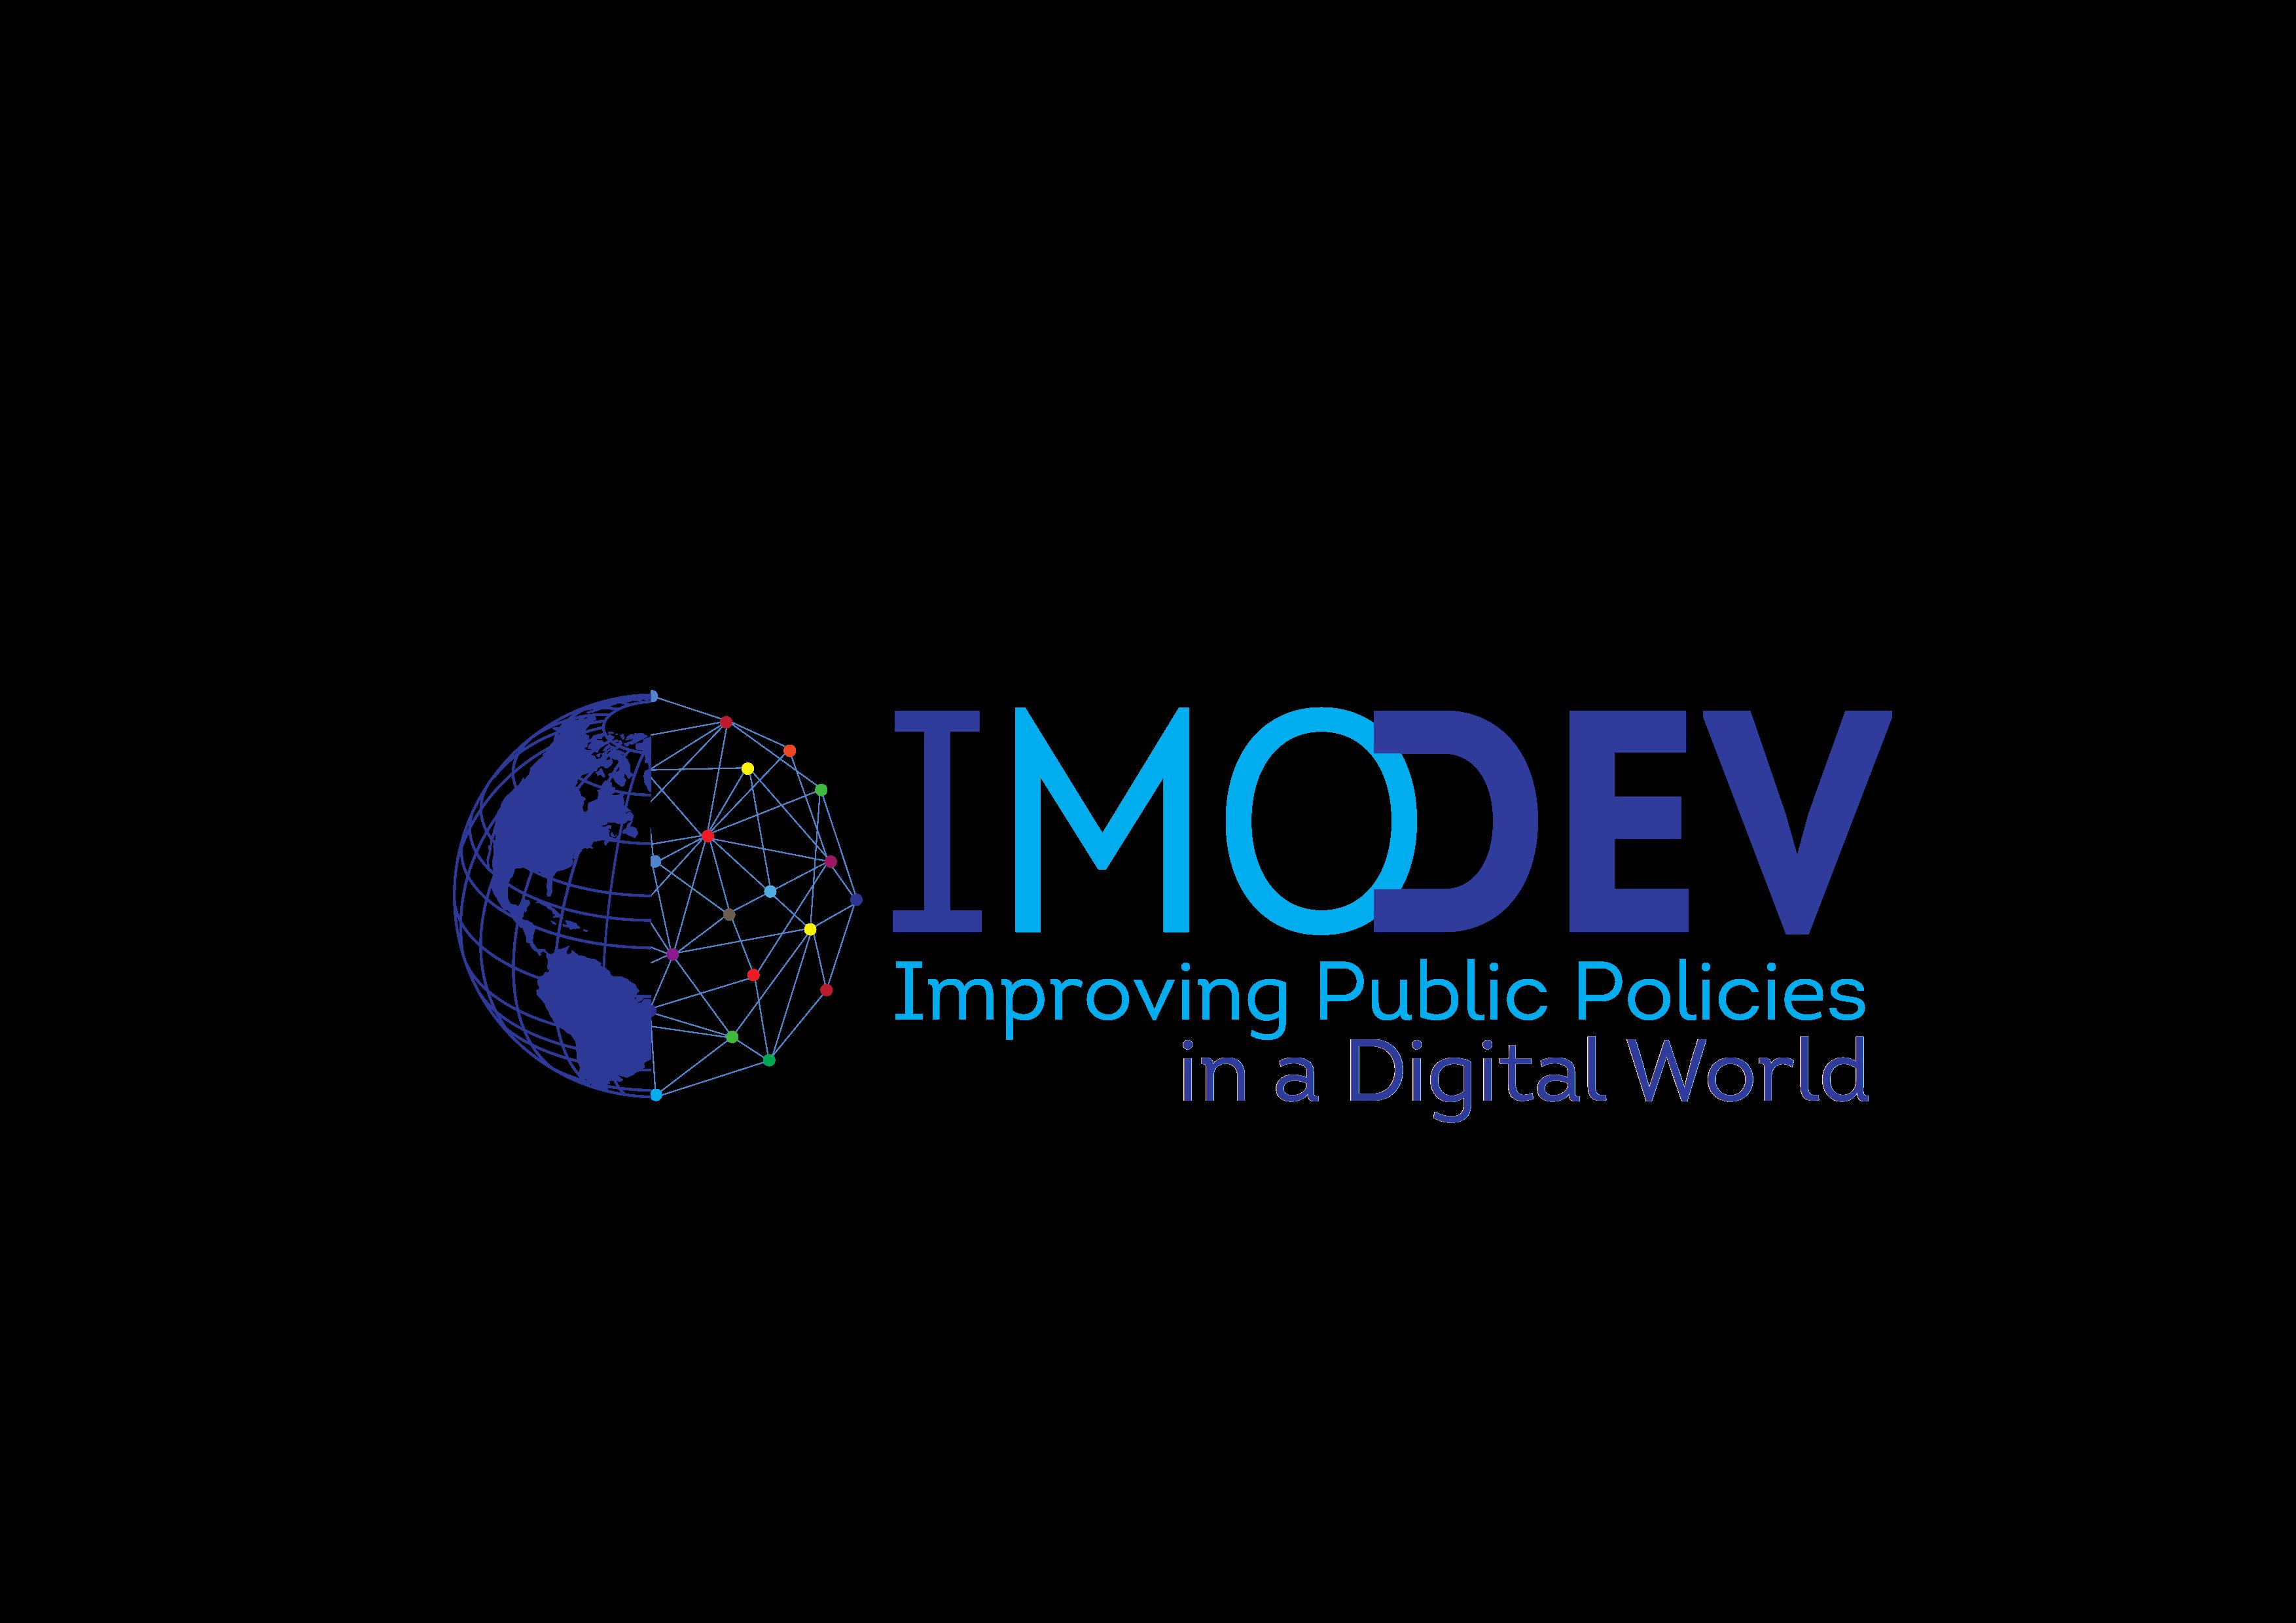 5cd6b5fb701 Kit communication visuelle  IMODEV - Improving public policies